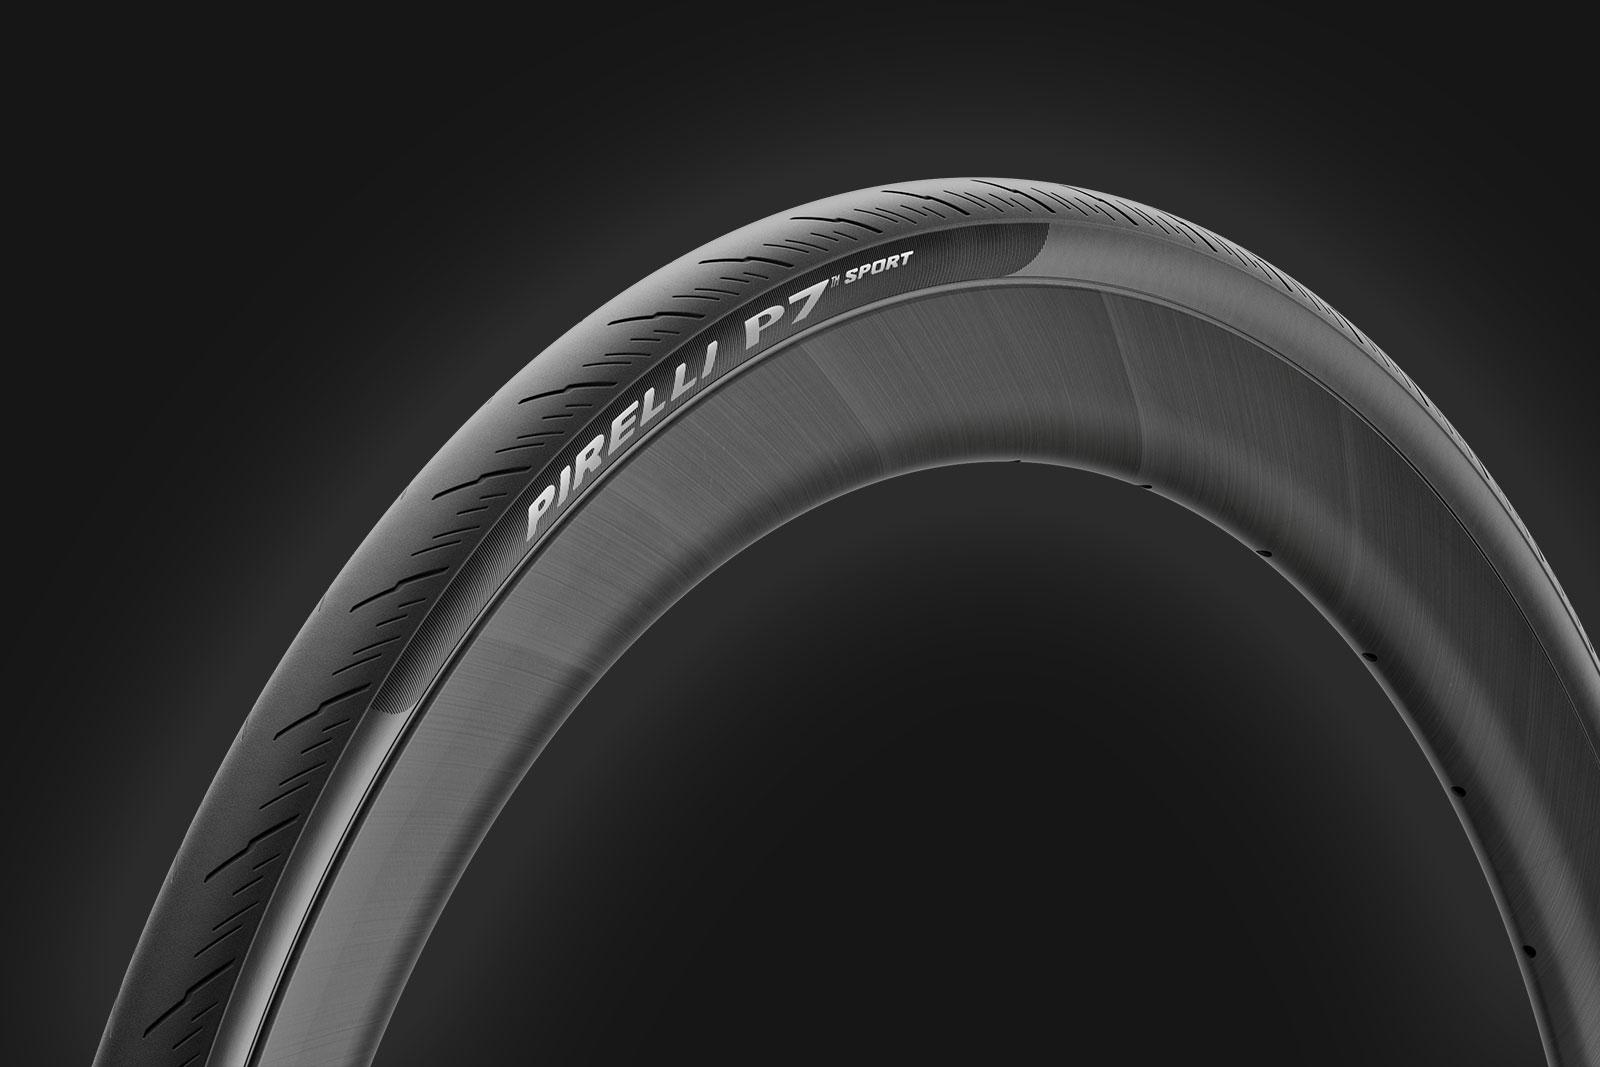 Pirelli P7 Sport clincher all-season road bike tire is grippy, durable & way more affordable - Bikerumor